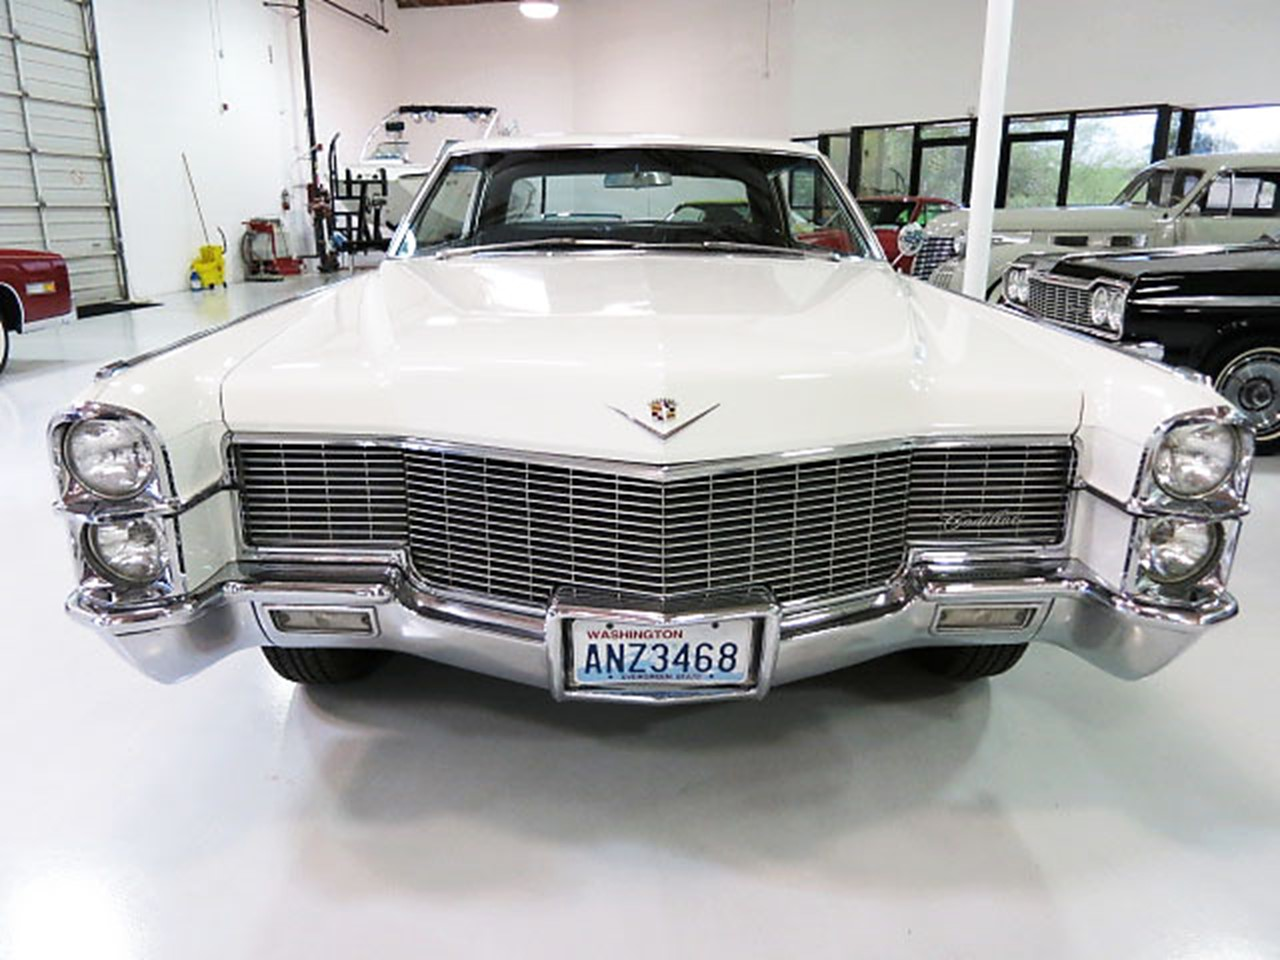 1965 Cadillac Coupe Deville Notoriousluxury